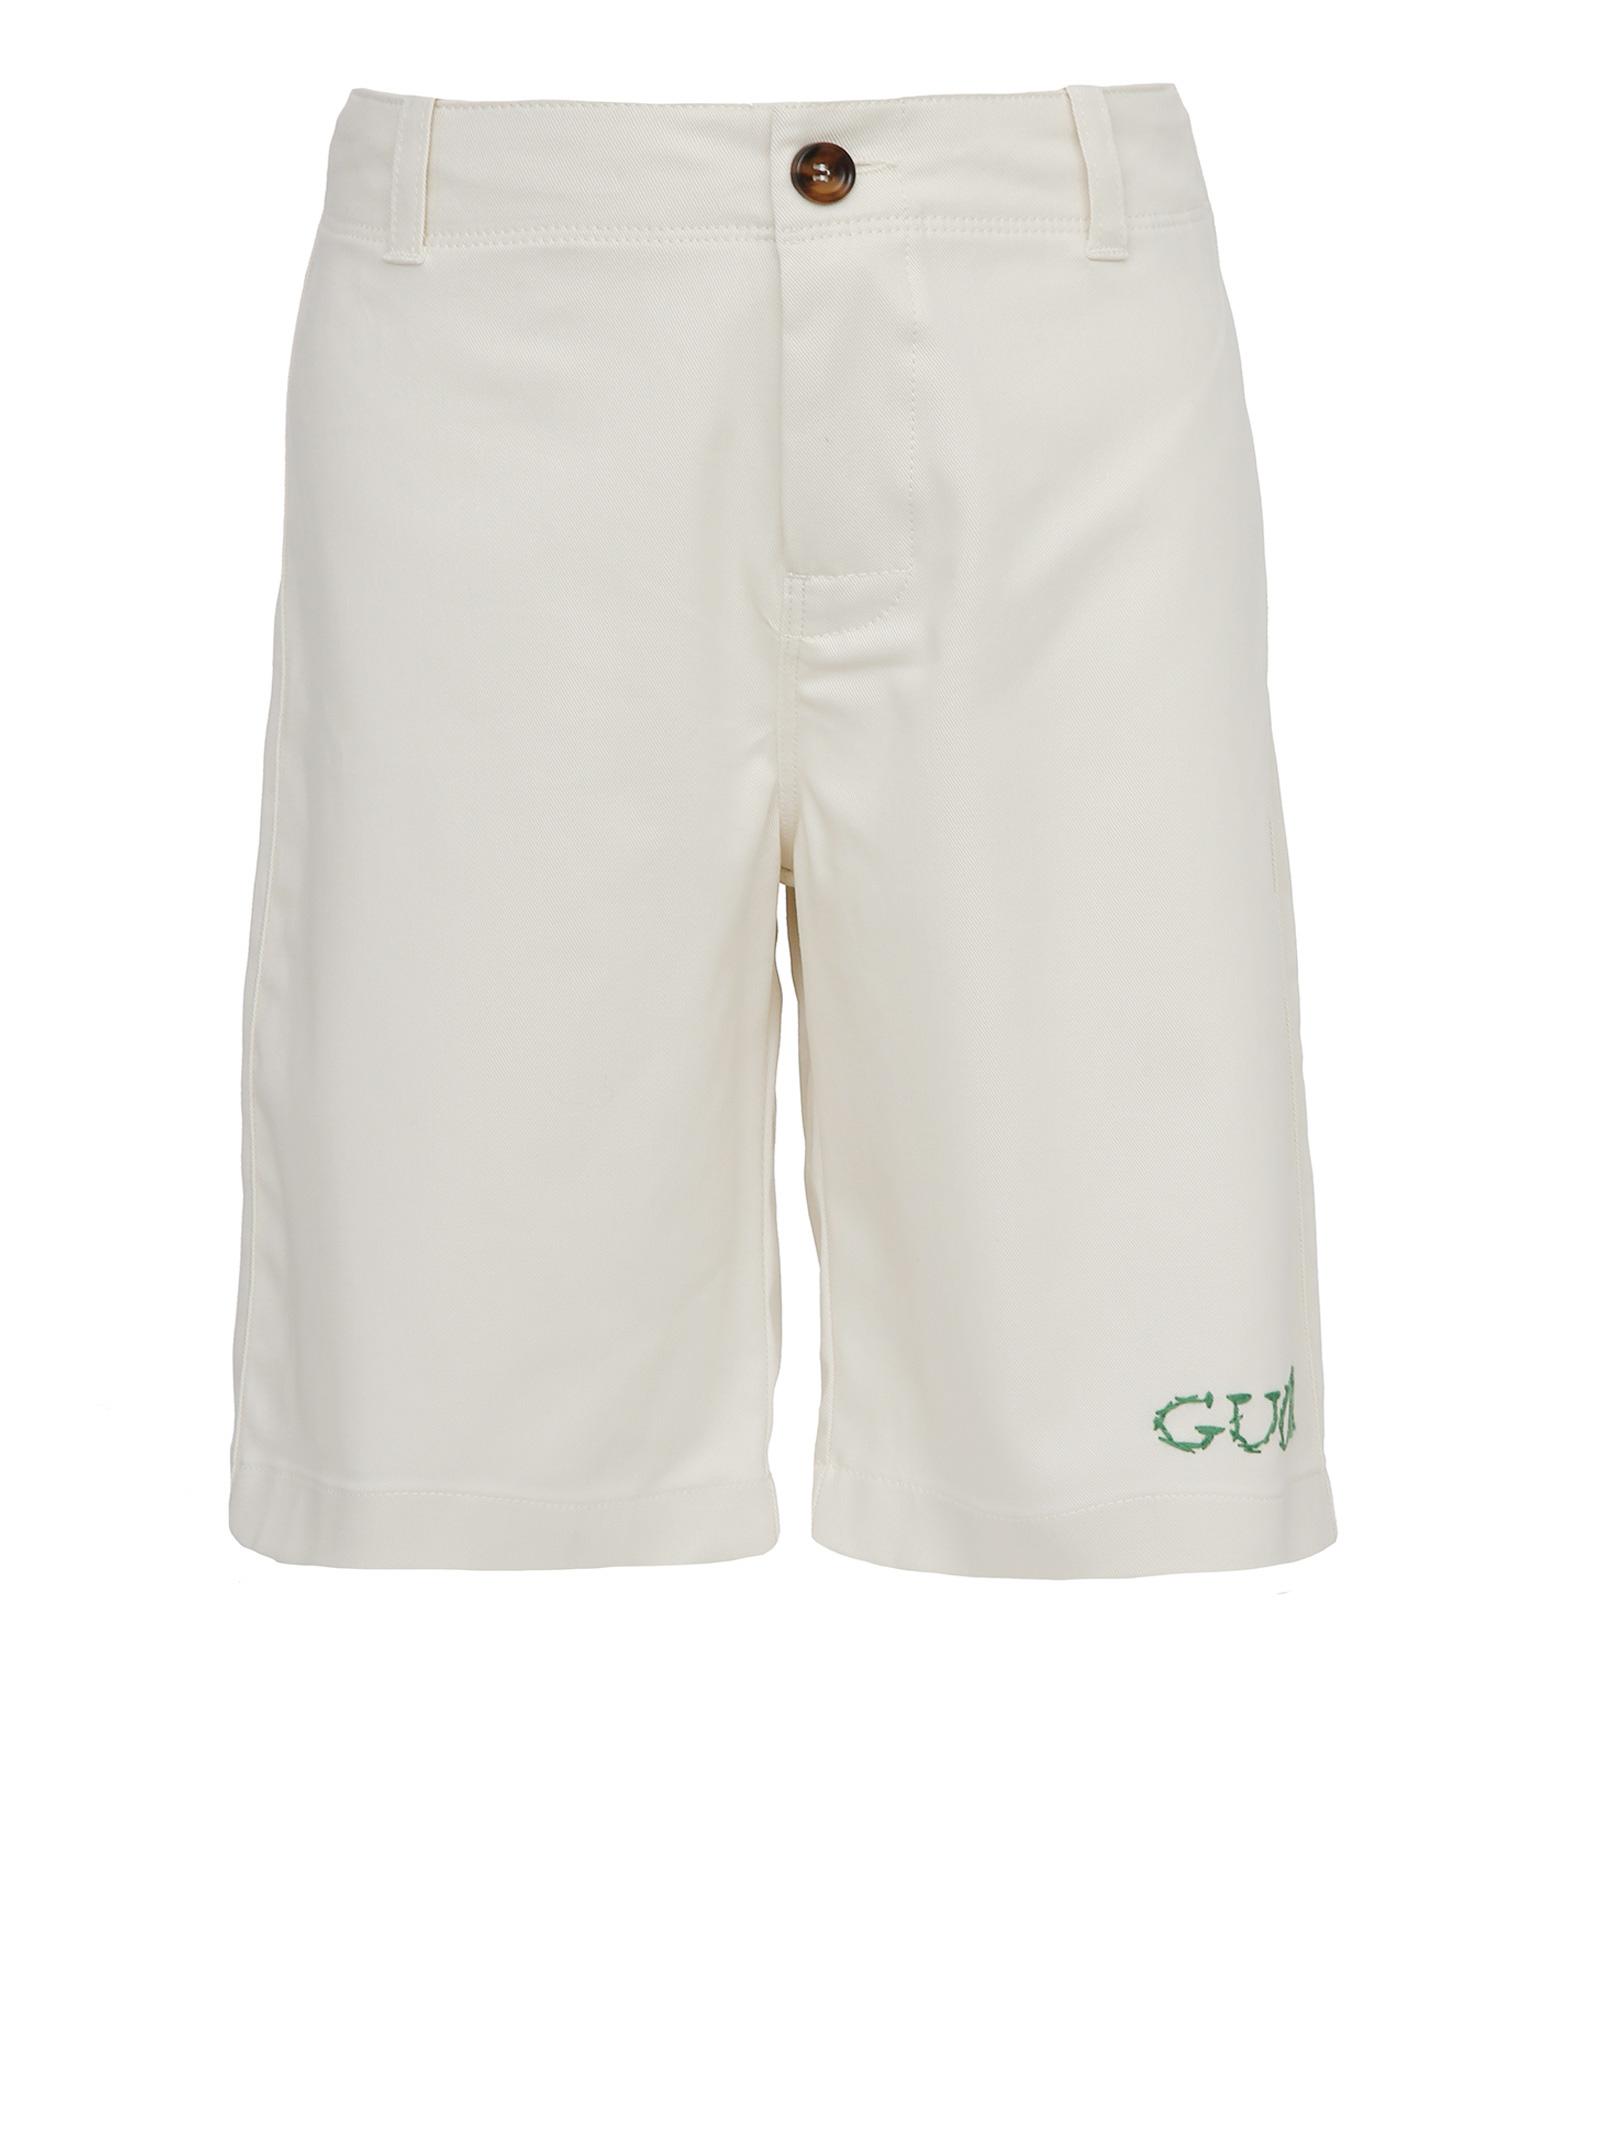 a0514ed2 Michele Franzese Moda. 0. Gucci Junior Shorts Gucci Junior | 30 |  540707XWAA09764